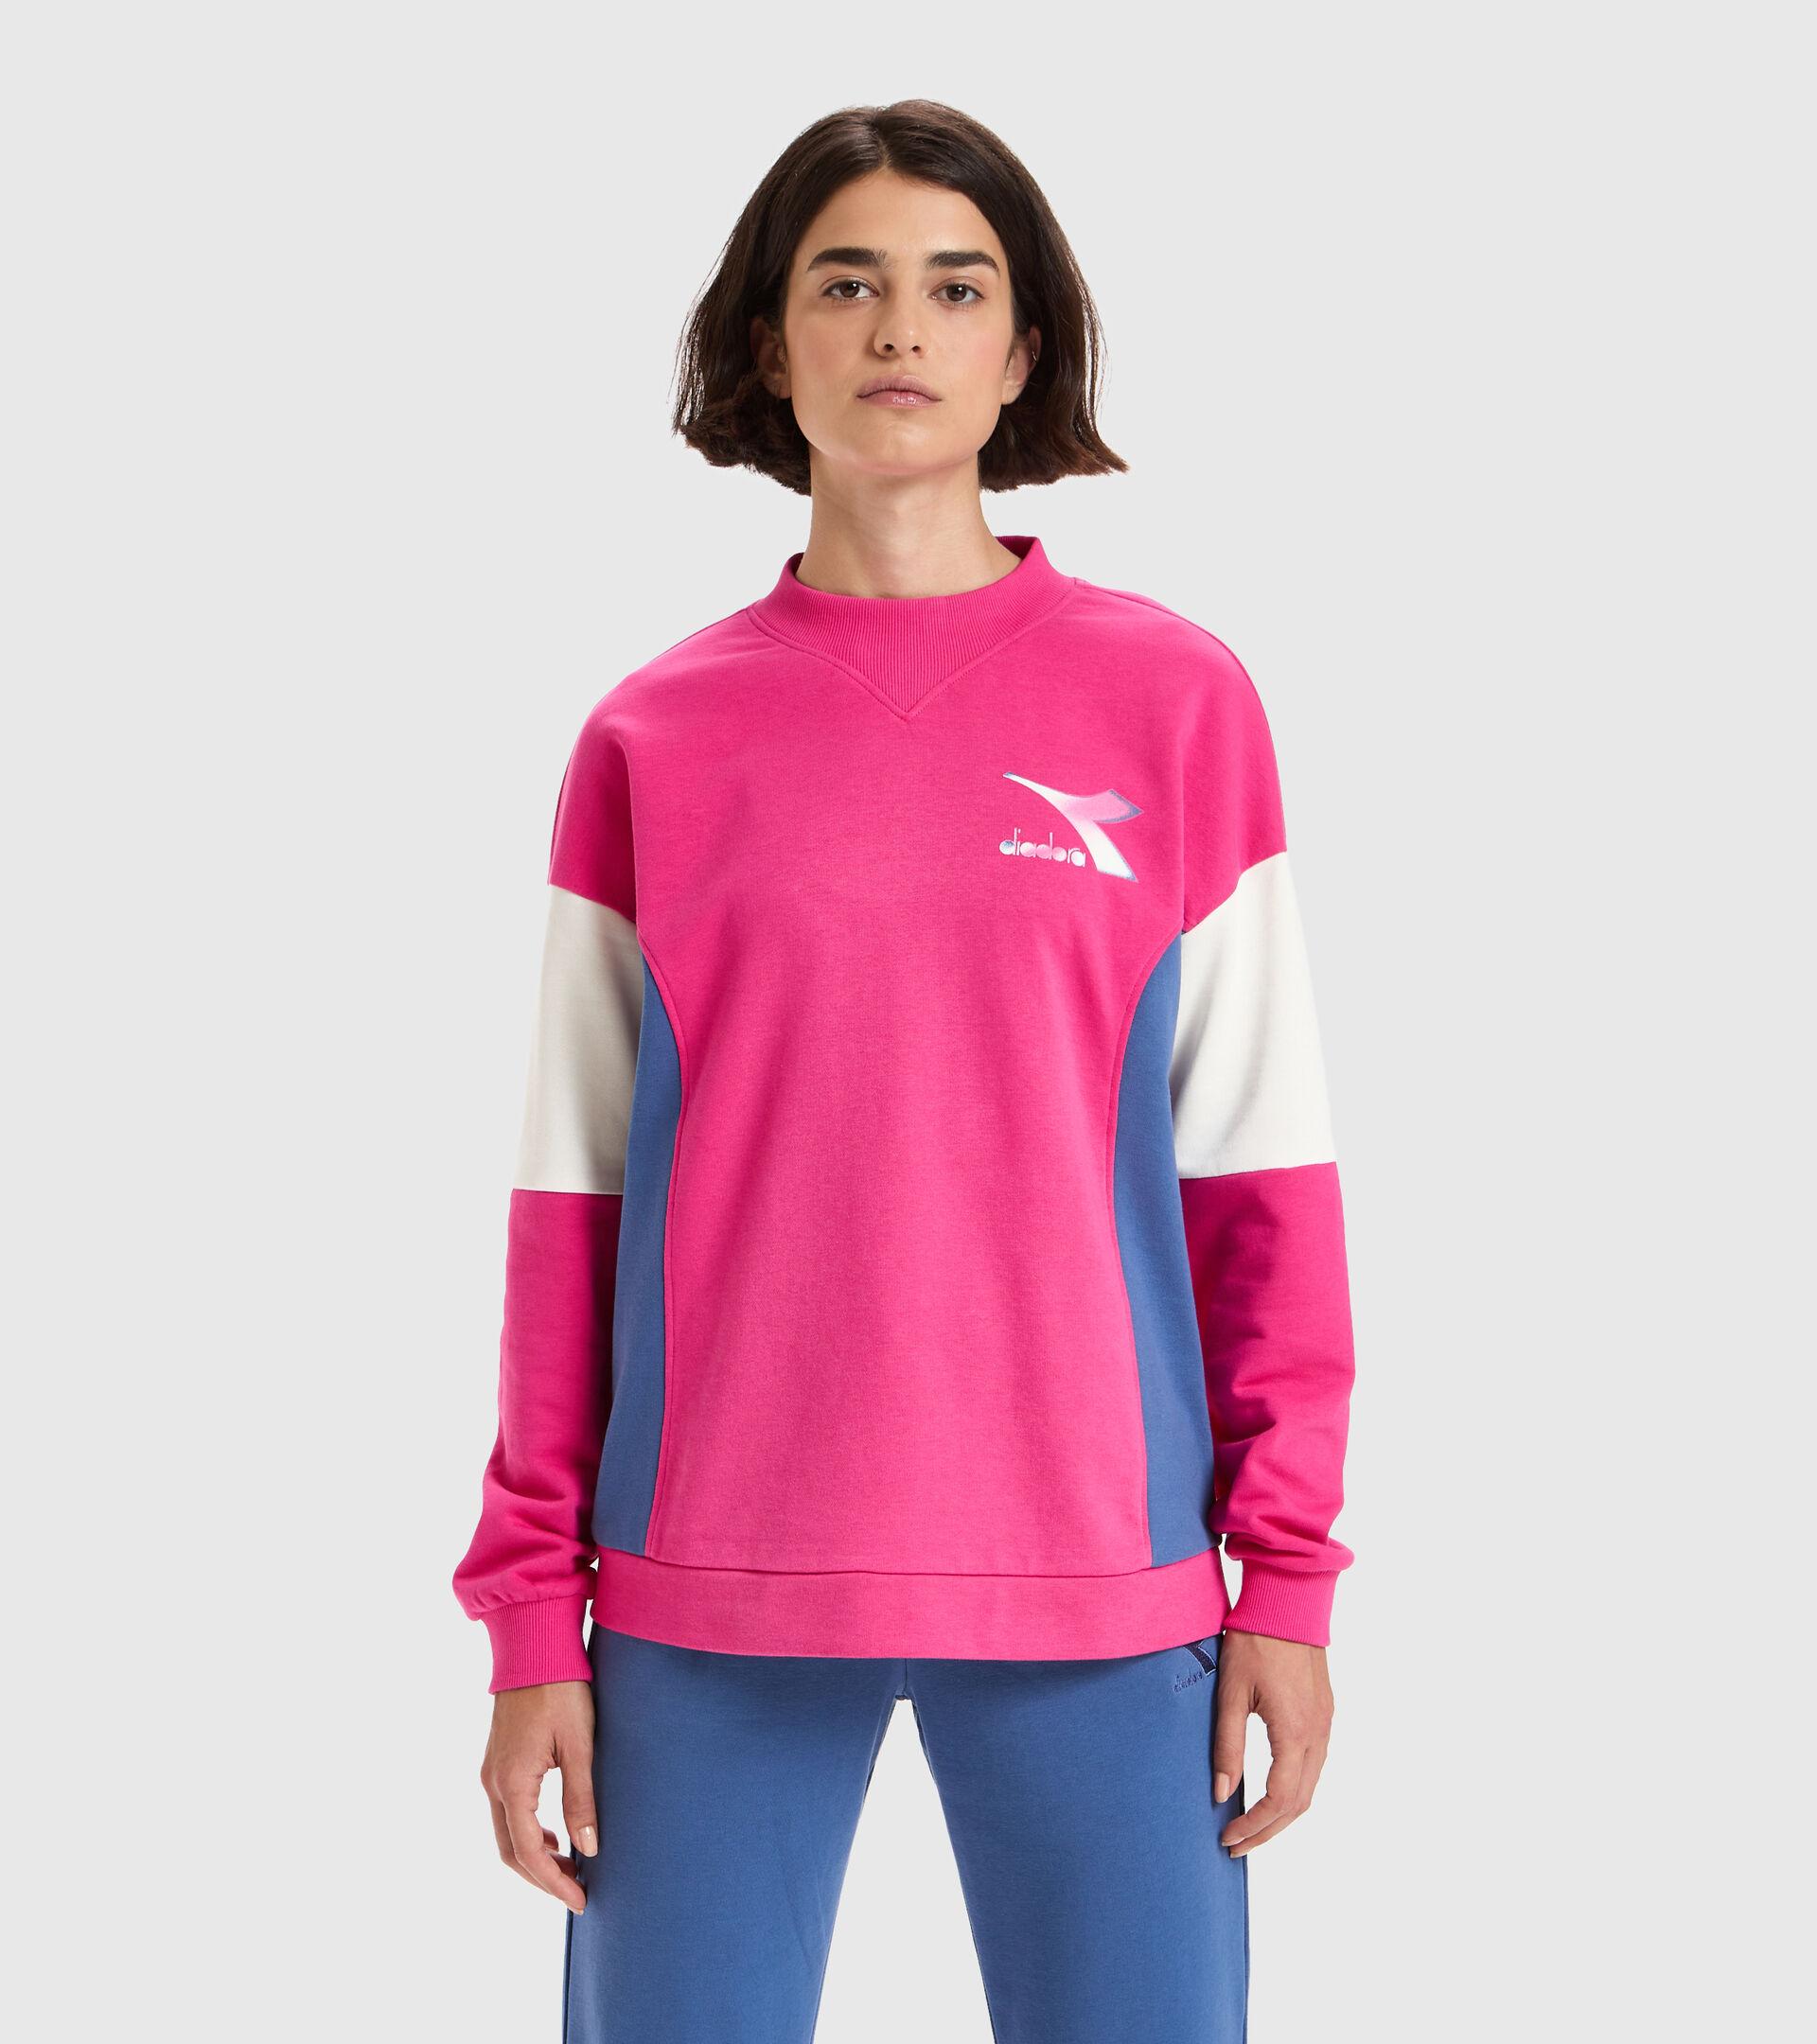 Apparel Sport DONNA L.SWEATSHIRT CREW LUSH MAGENTA Diadora